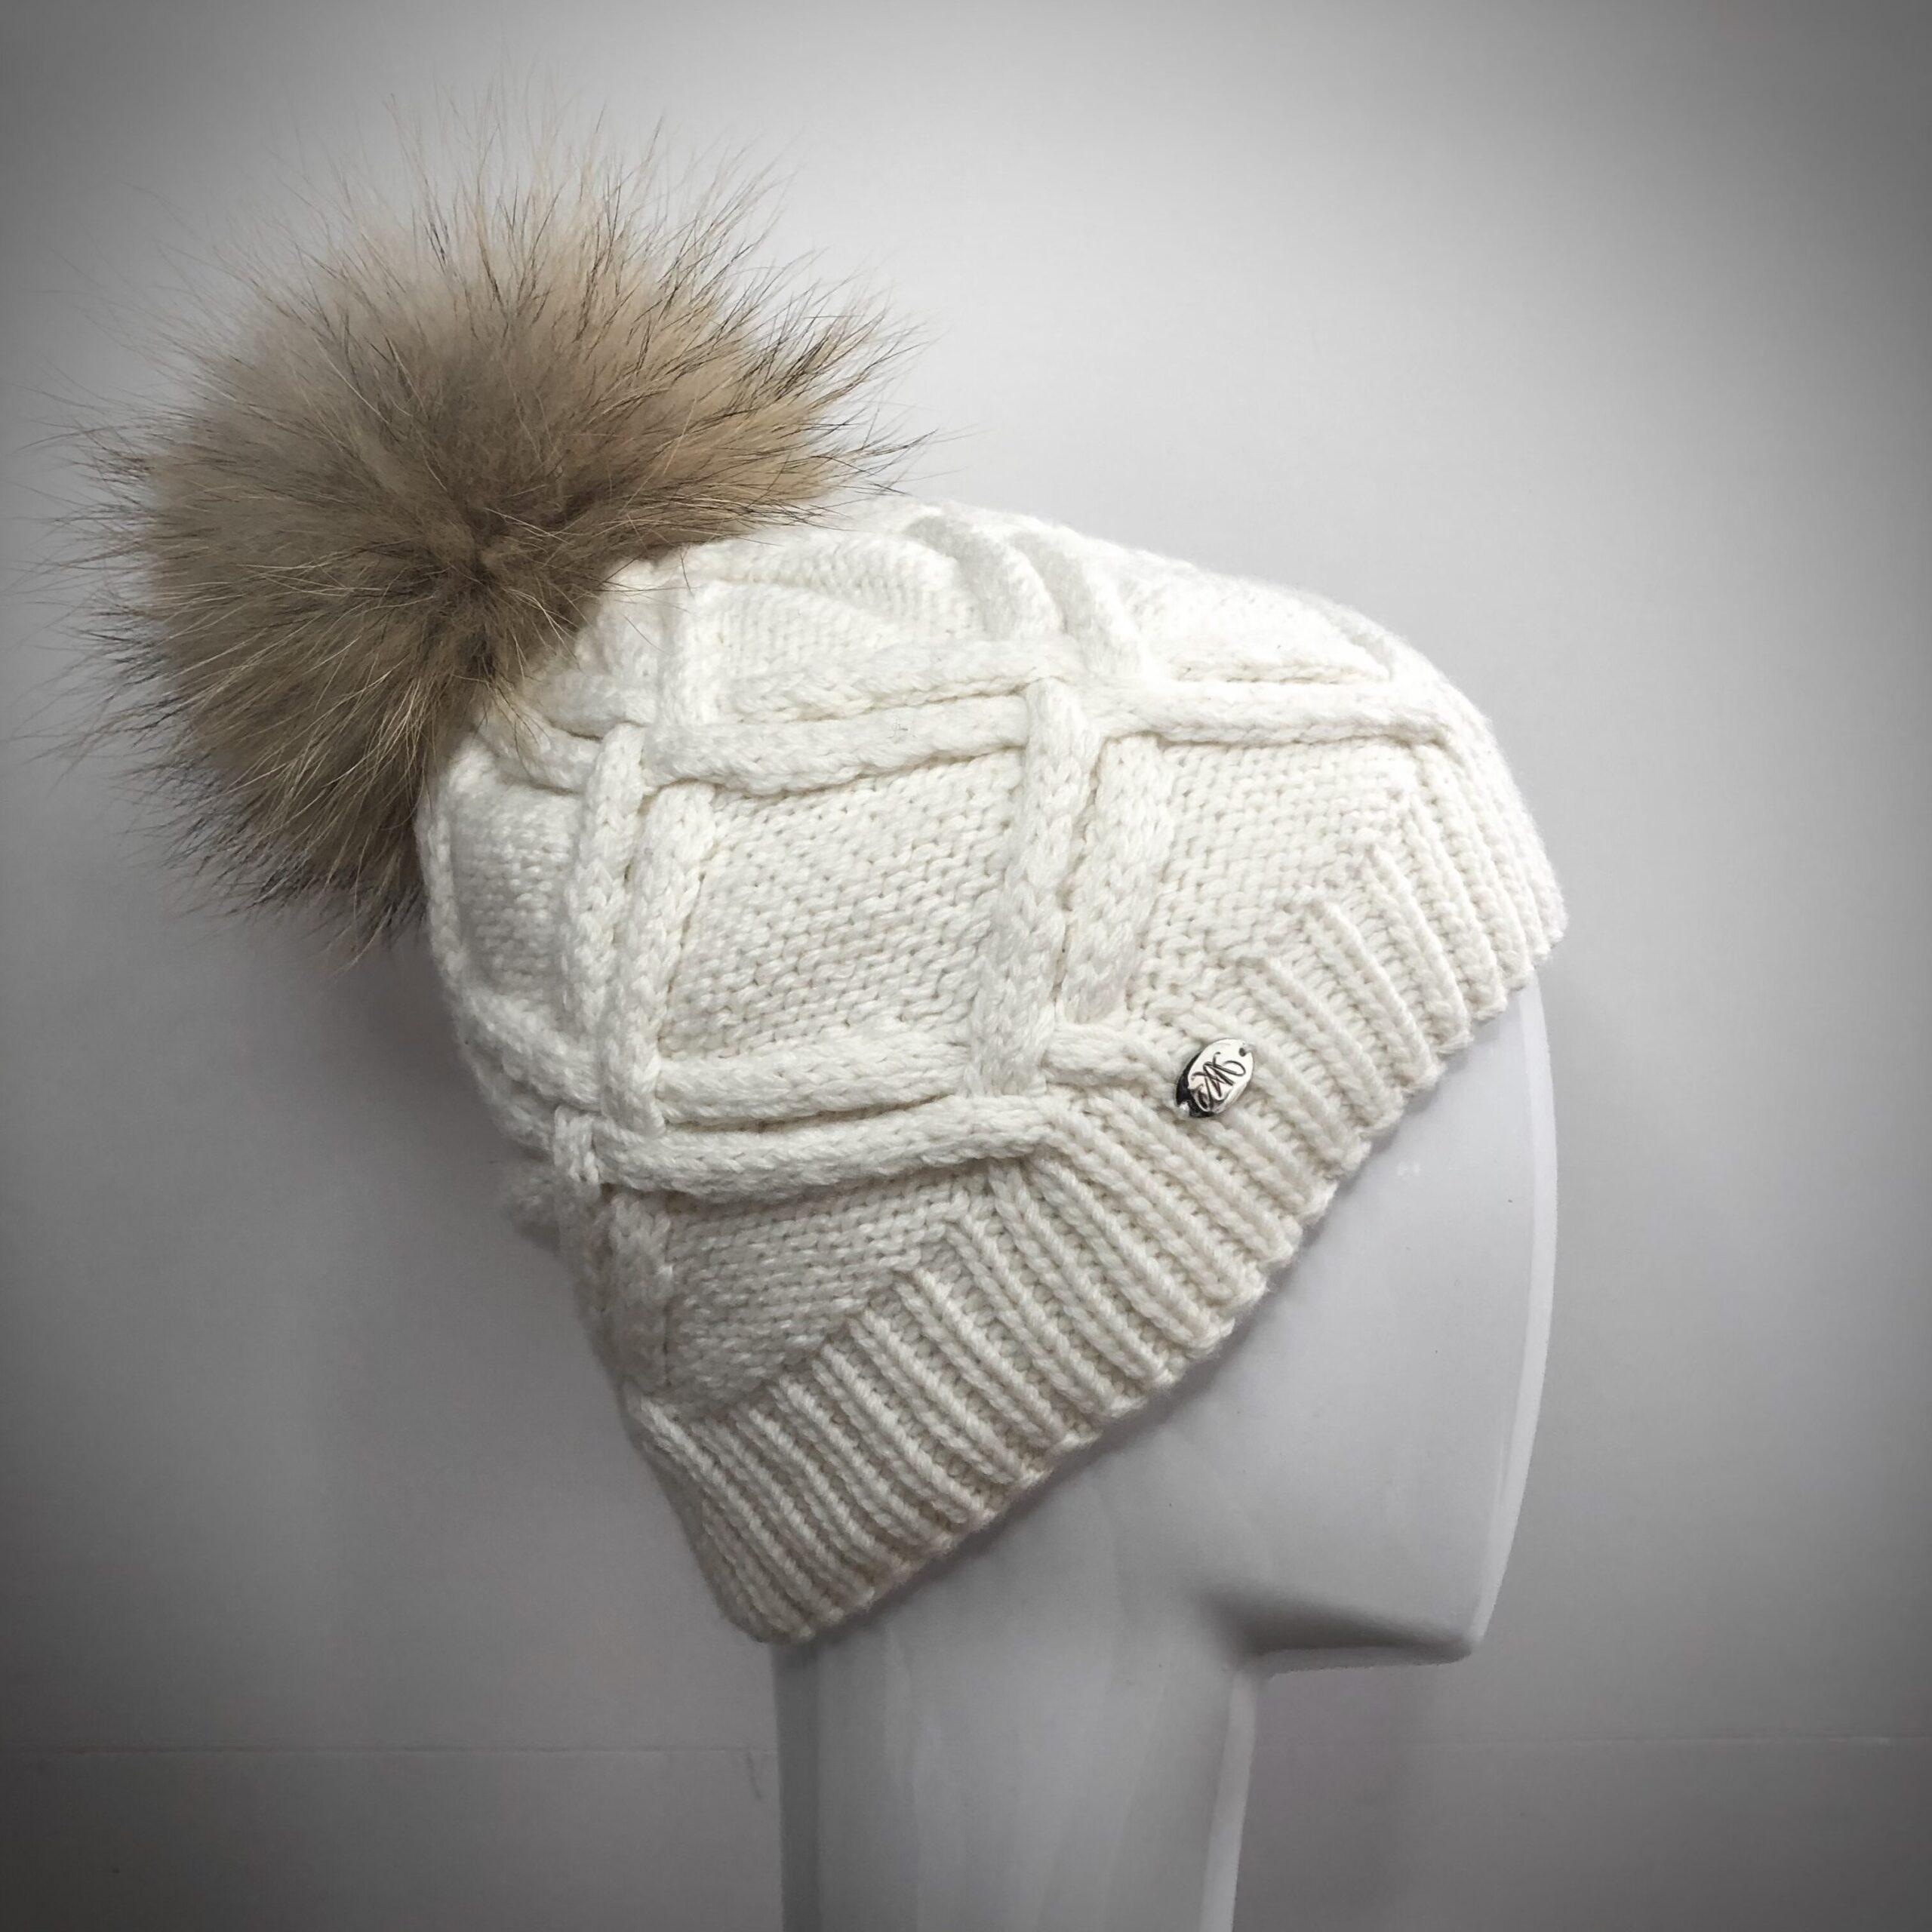 High quality hand knitted pom pom hat Average size